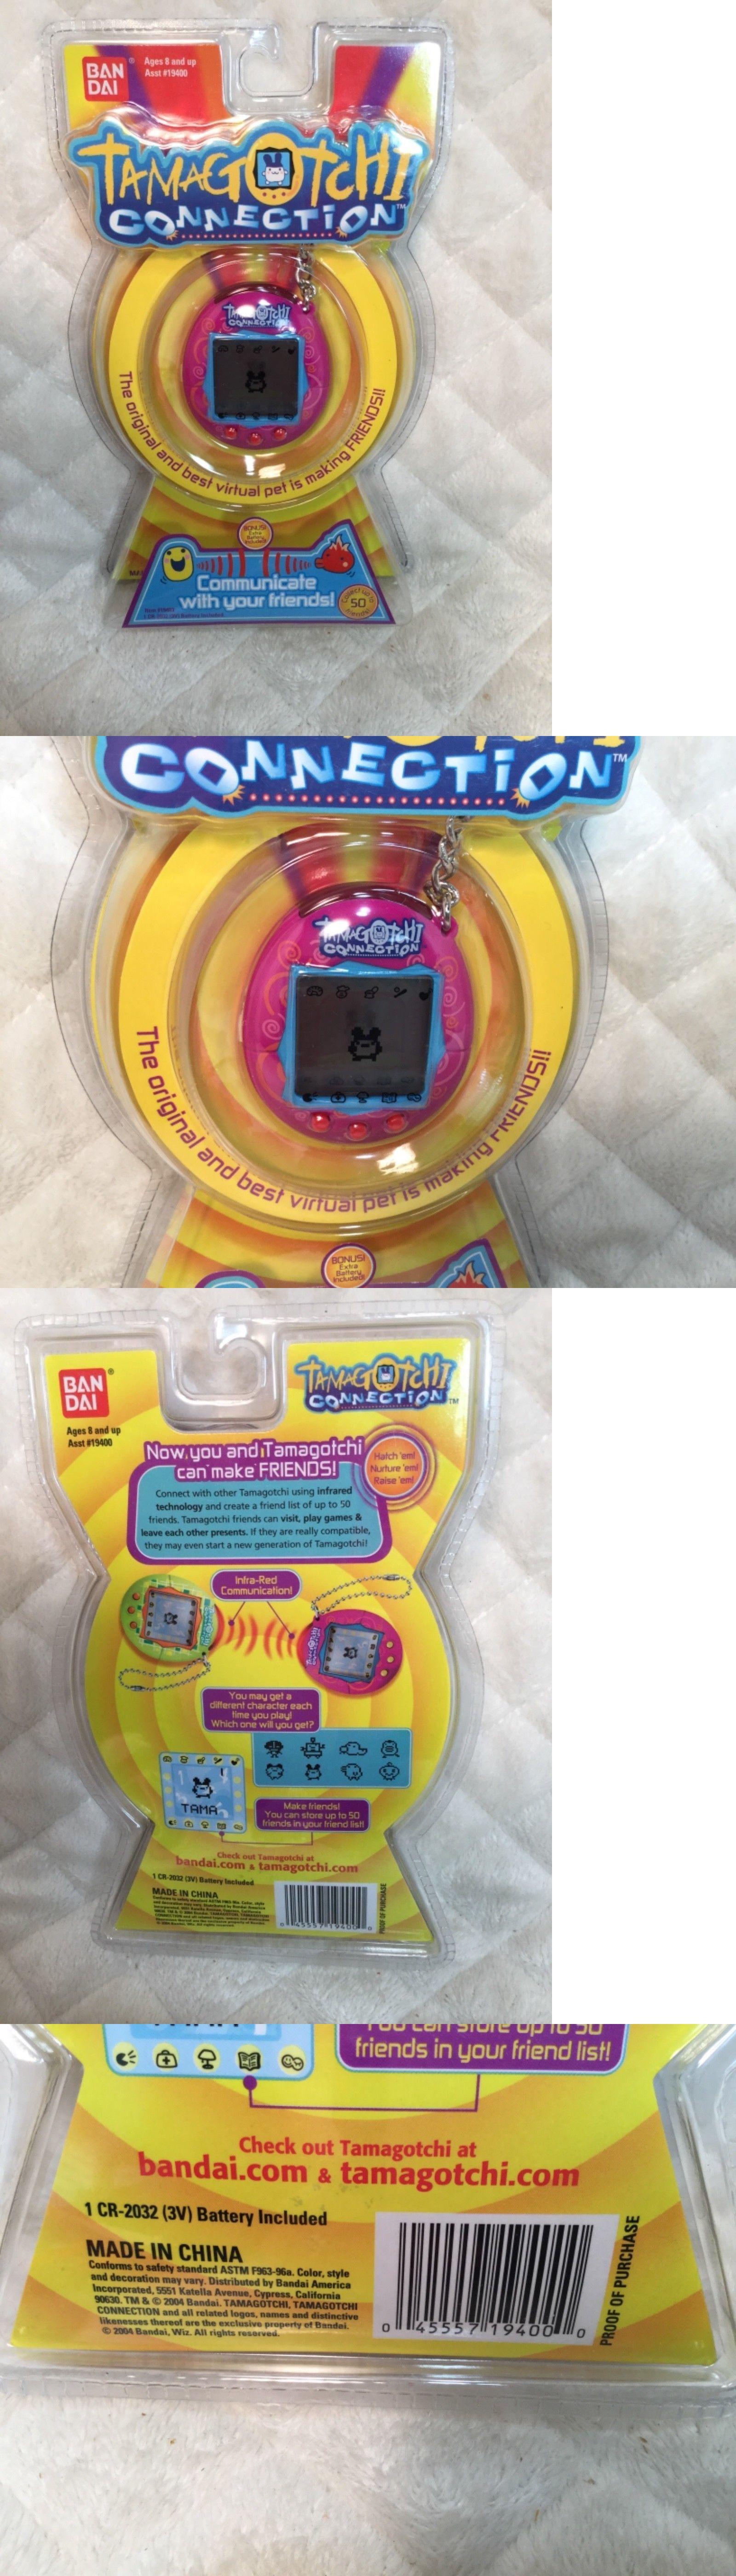 Bandai Tamagotchi Connection Pink u Blue With Orange Swirls NEW